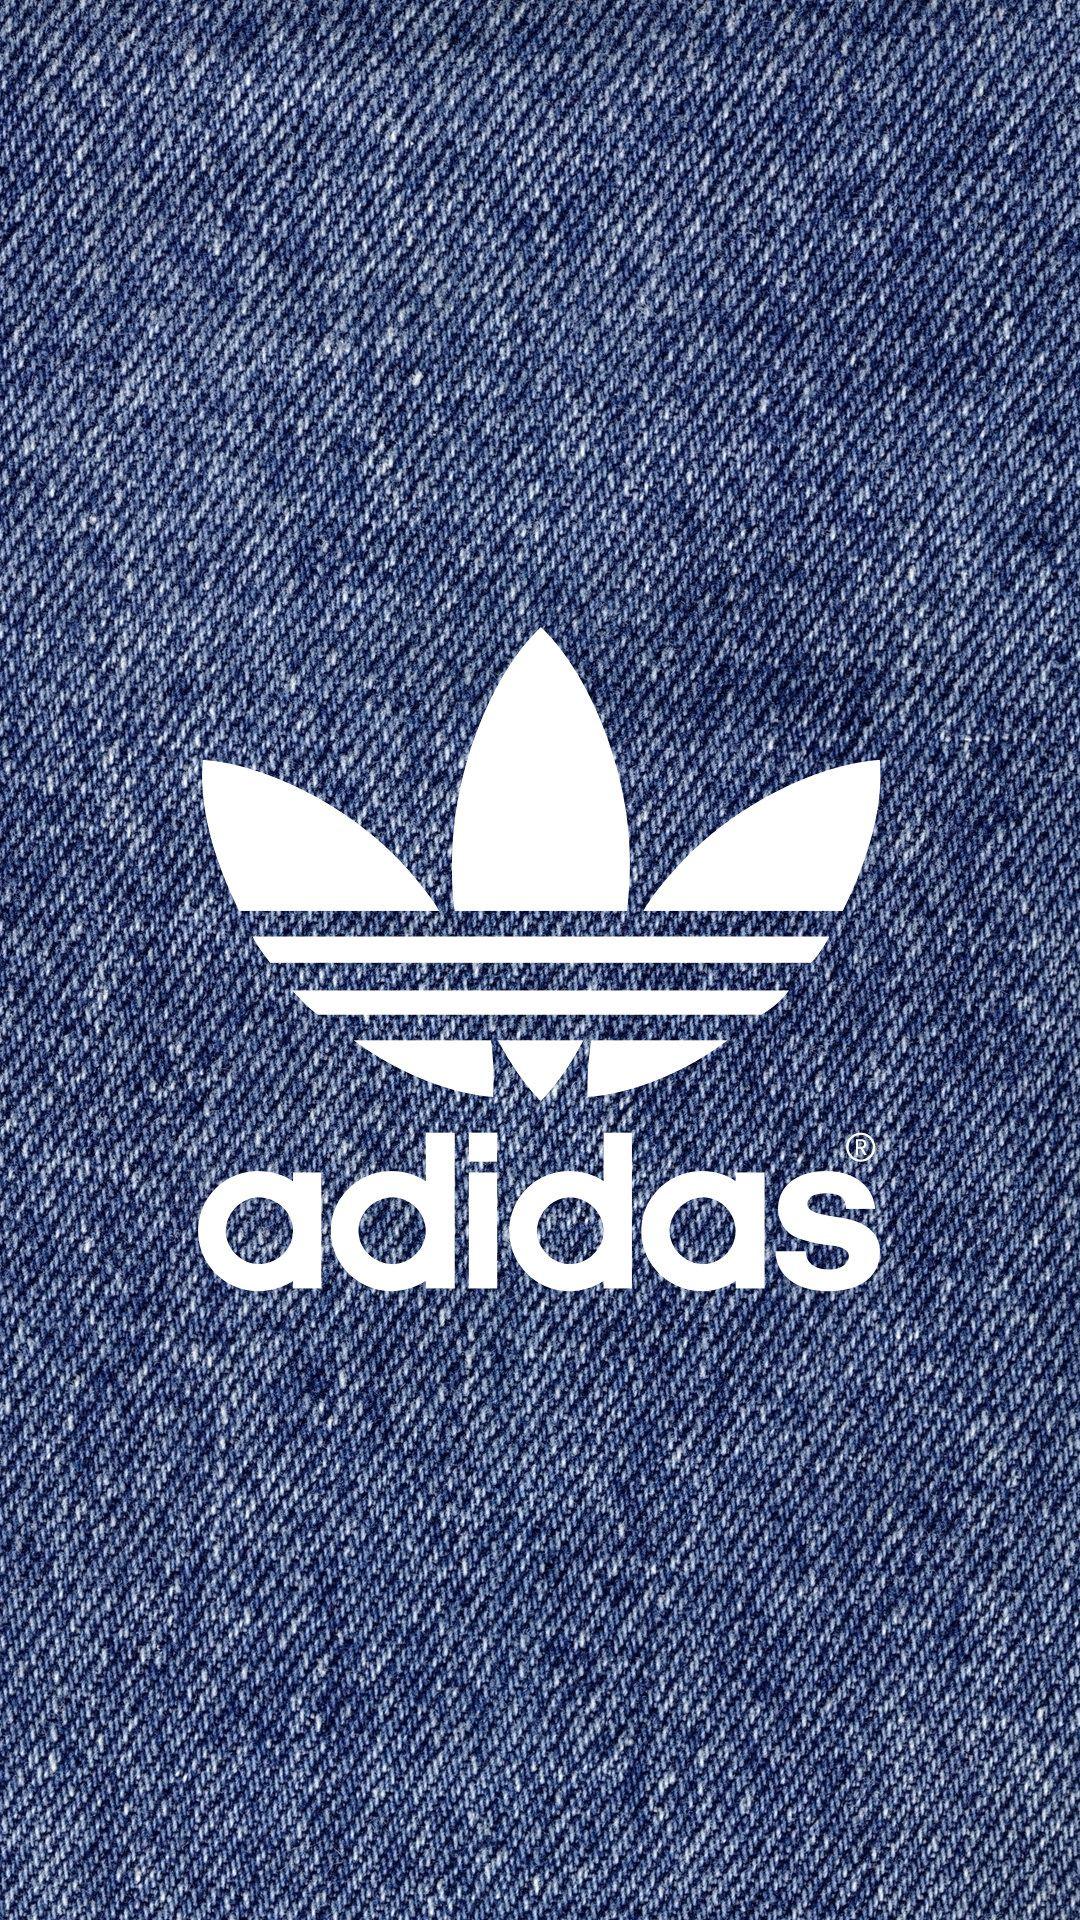 Adidas Brand Iphone Wallpaper Sports Adidas20